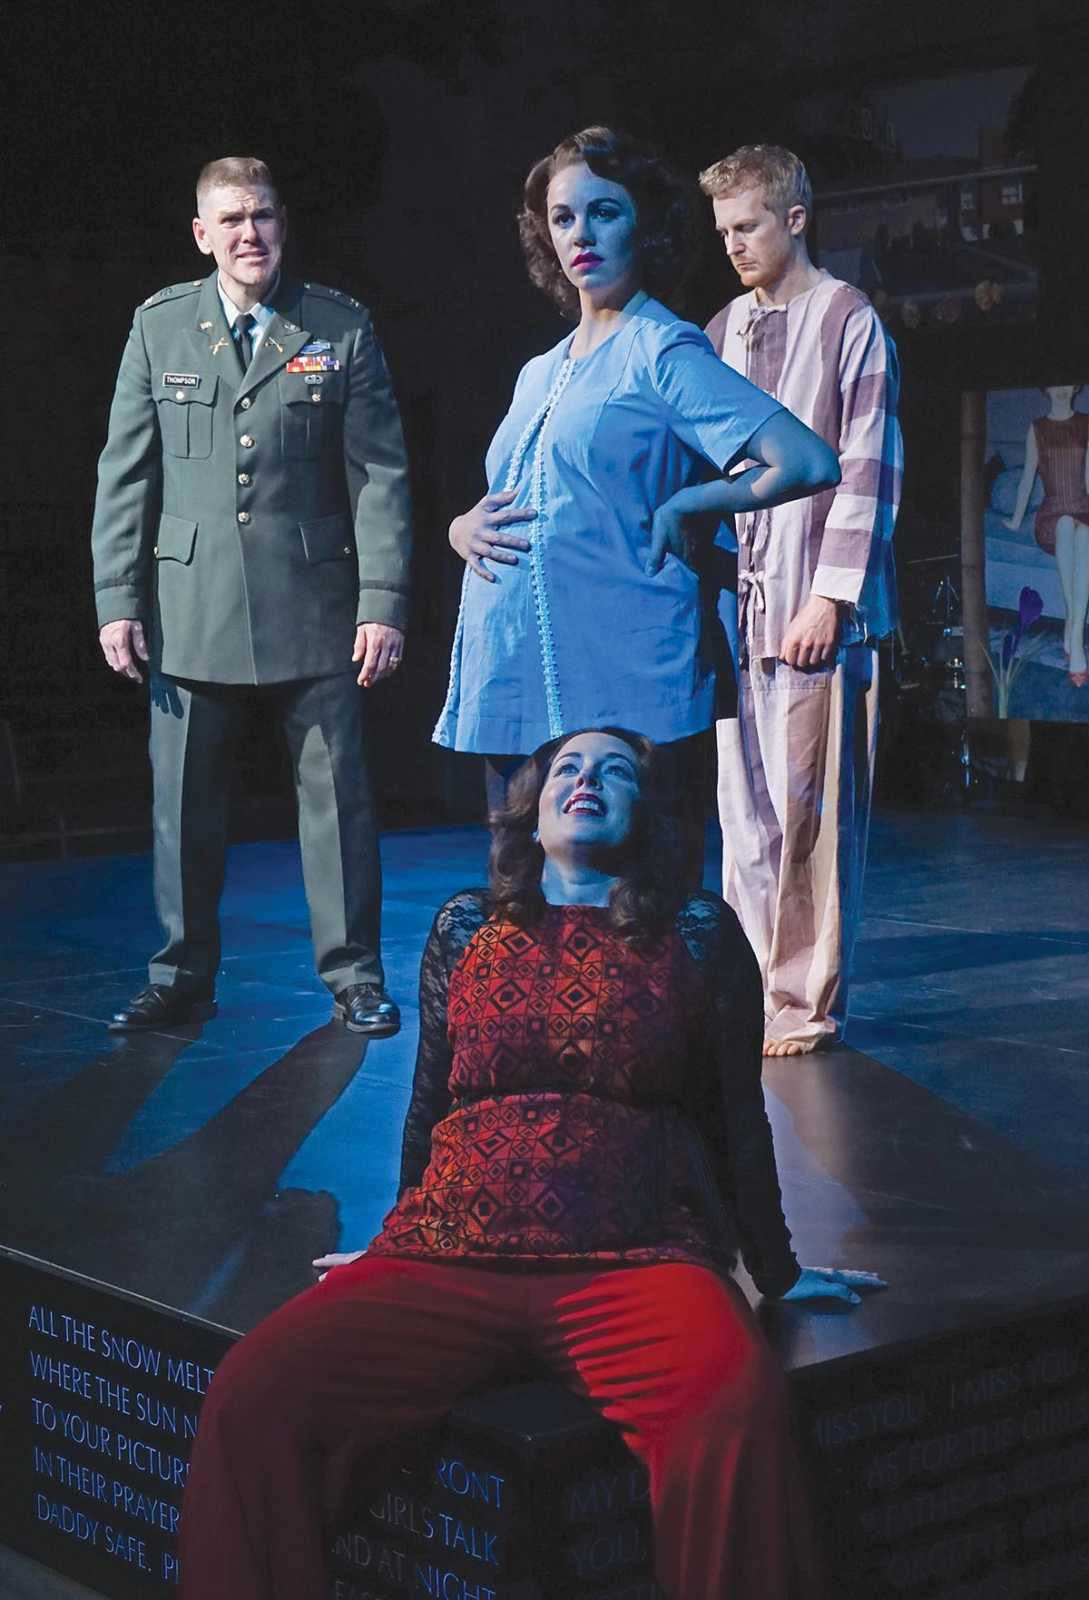 glory-denied-courtesy-of-nashville-opera-gcast